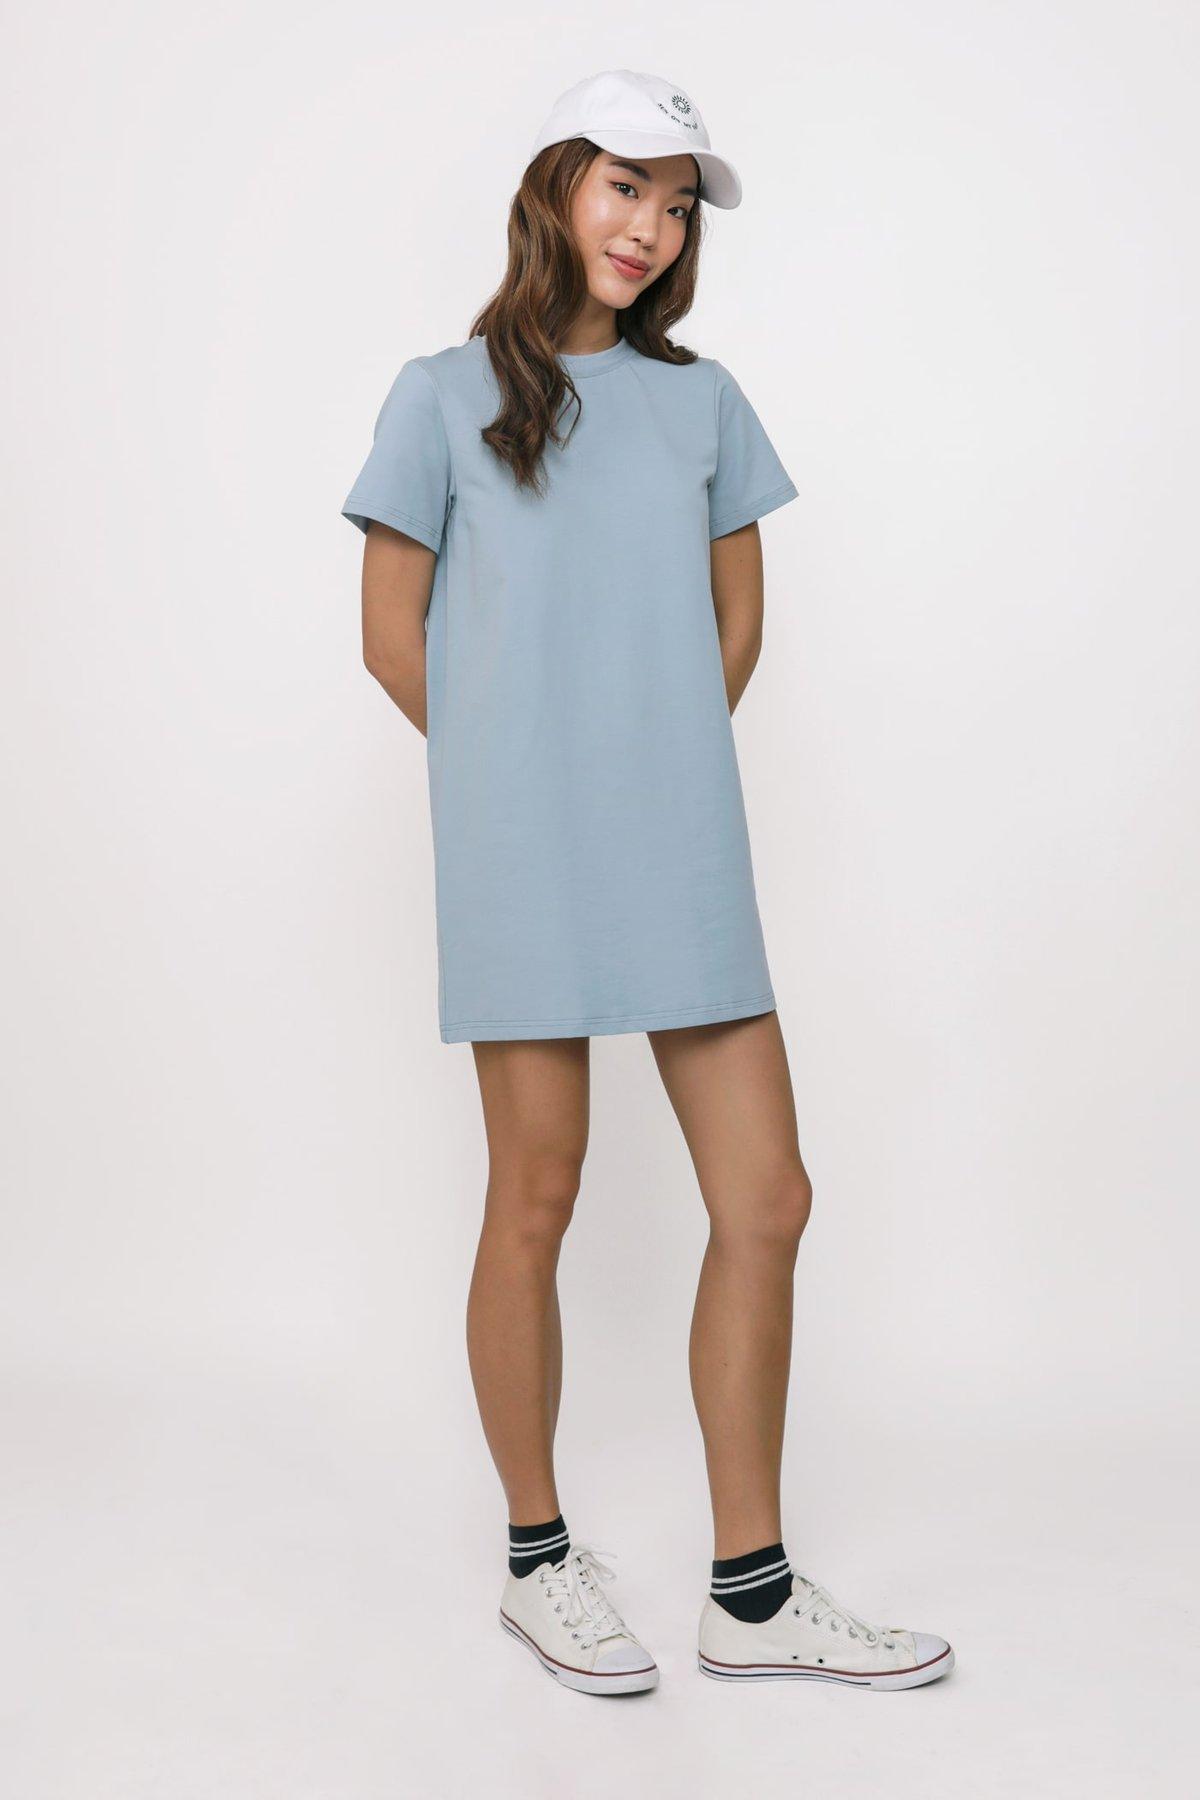 Ariane T-Shirt Dress (Blue)